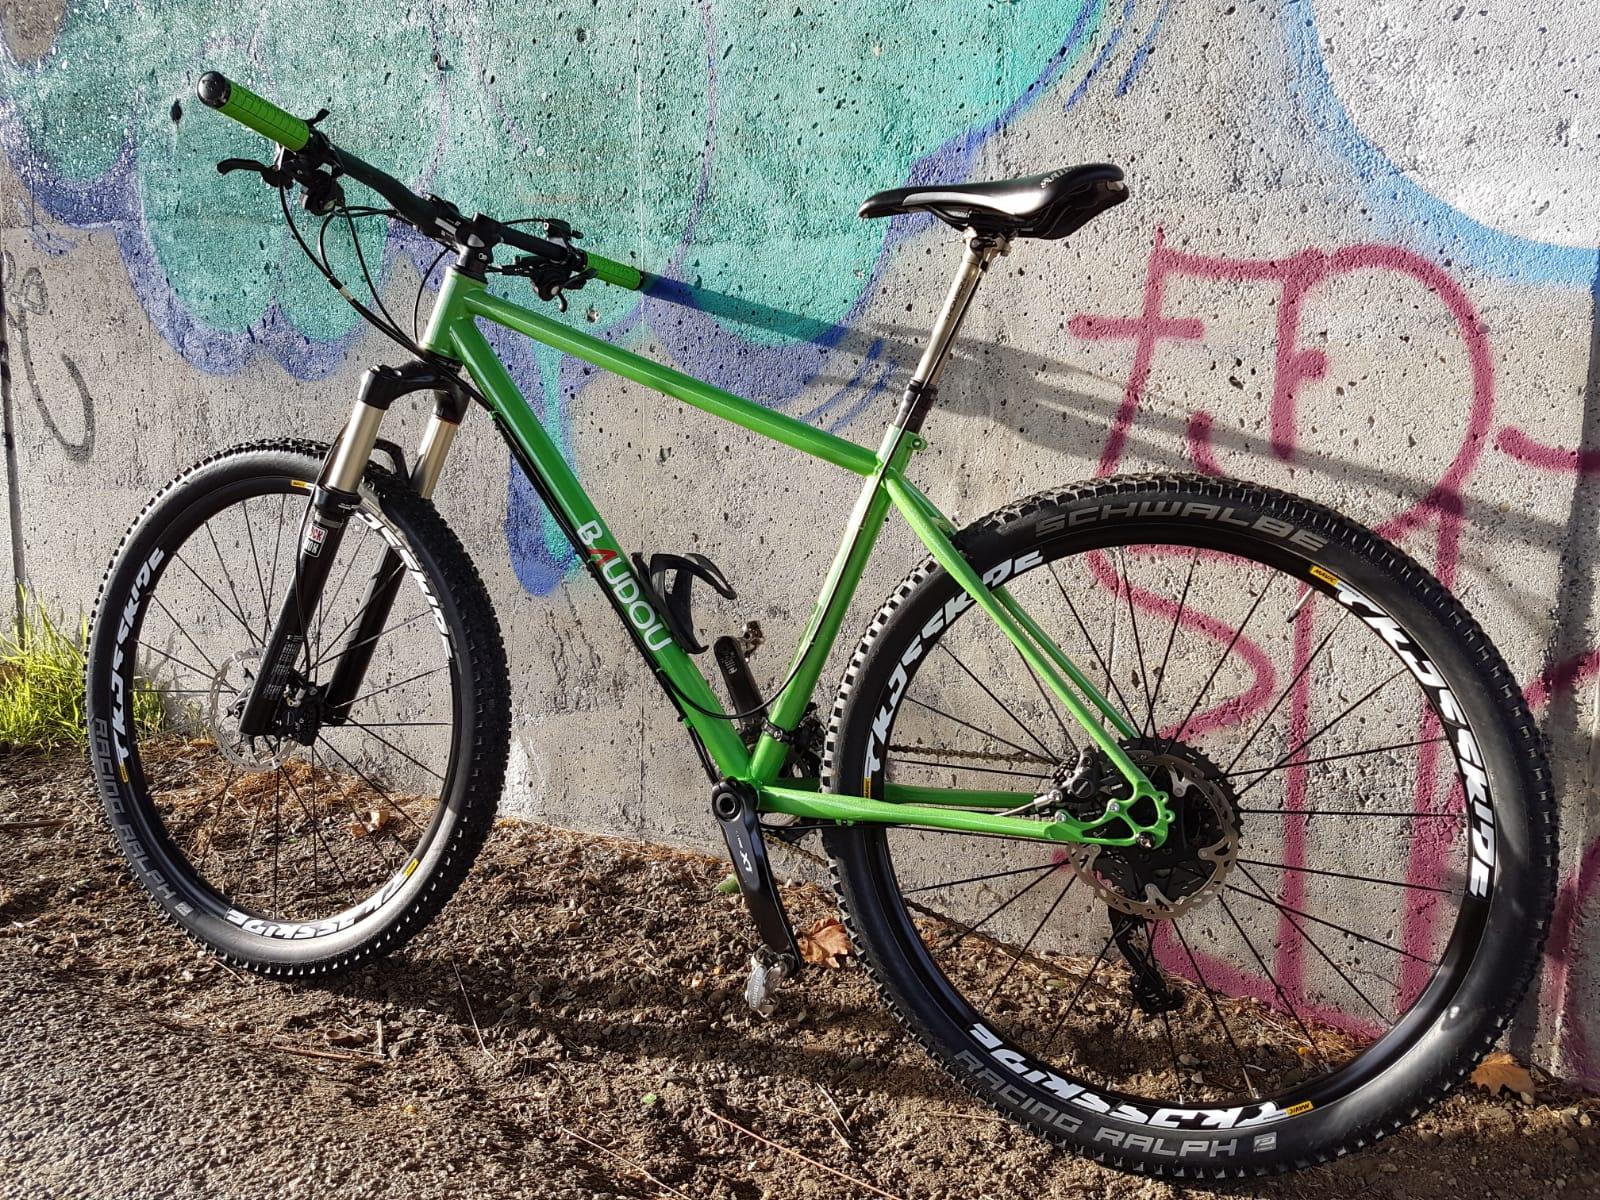 VTT_BAUDOU_Bikes_Arr